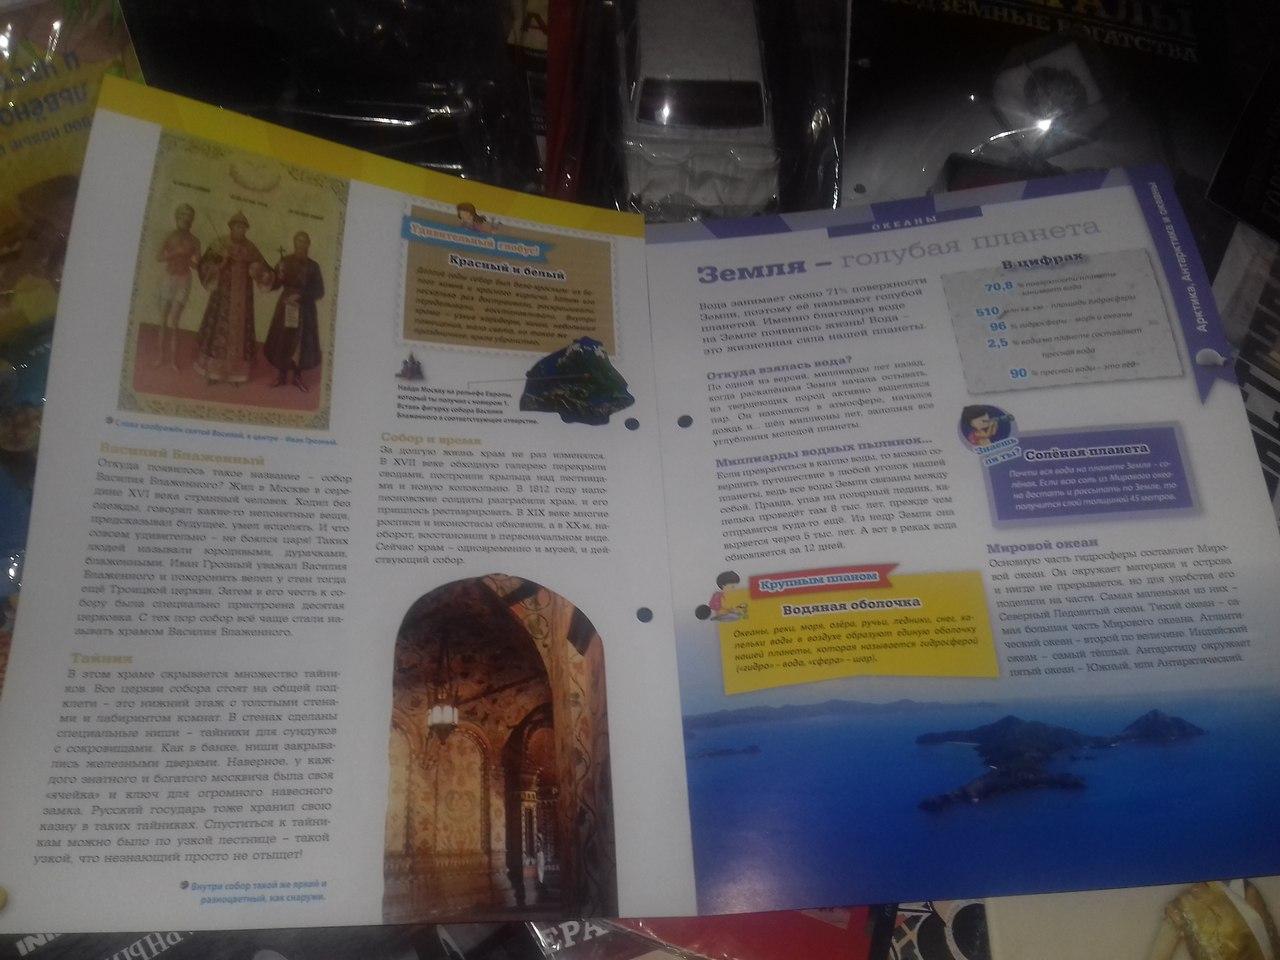 Собери Чудо-Глобус - Hachette - тест (перезапуск)